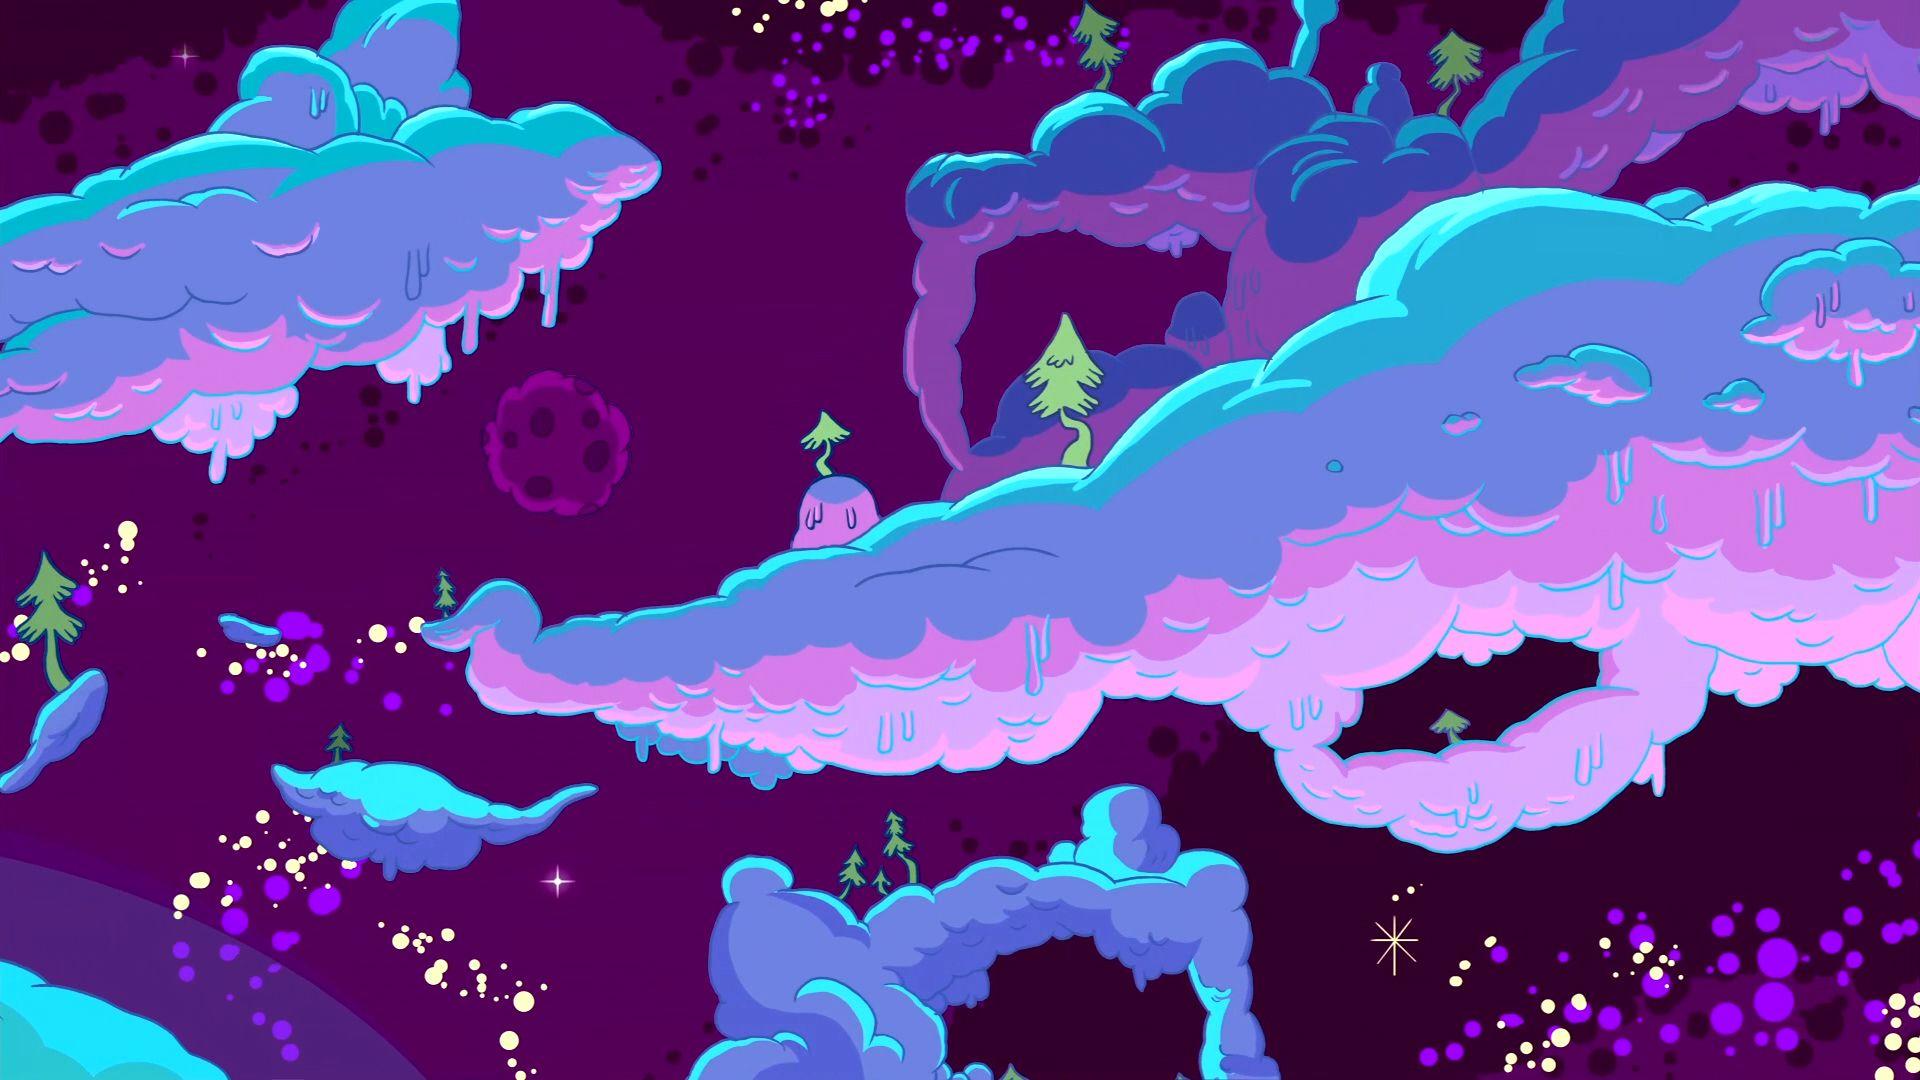 S01e02 Lumpy Space Adventure Time Wallpaper Adventure Time Background Adventure Time Art